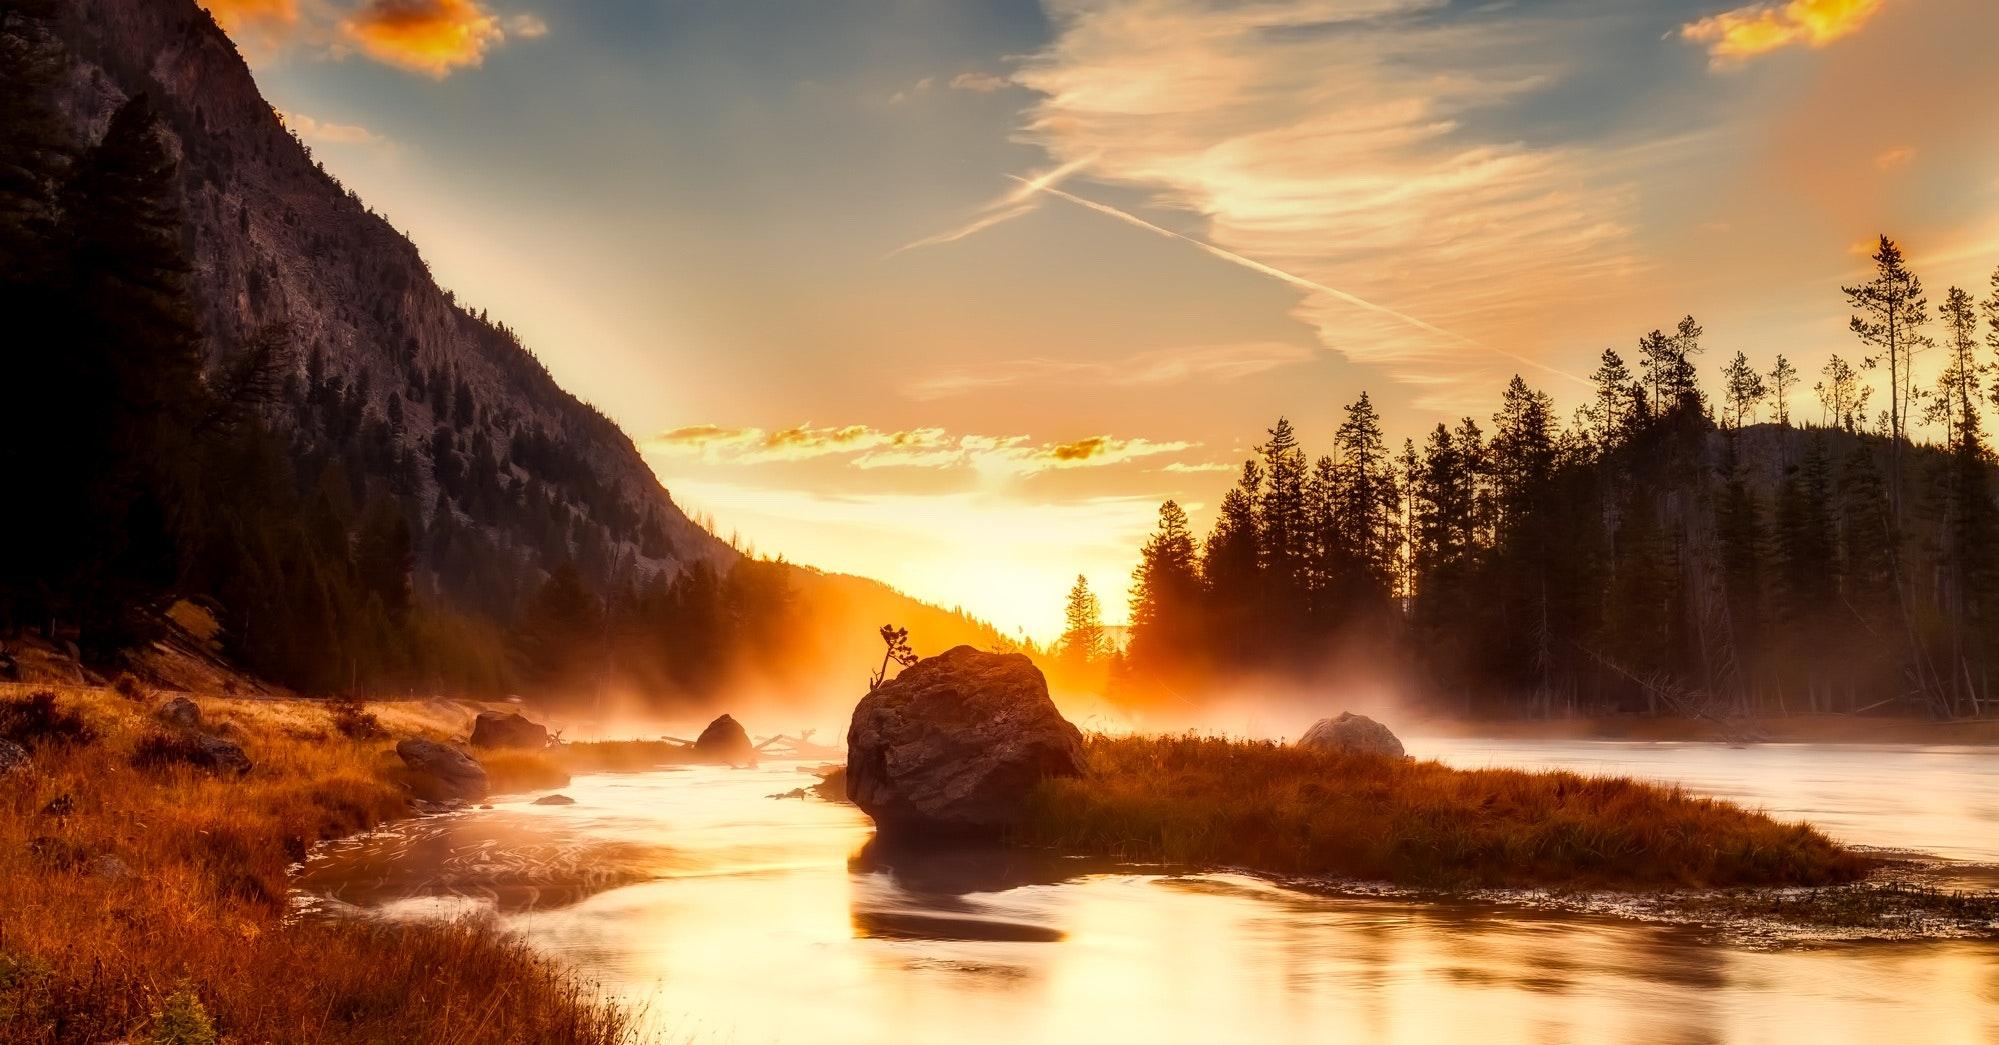 River Landscape Photography Free Stock Photo